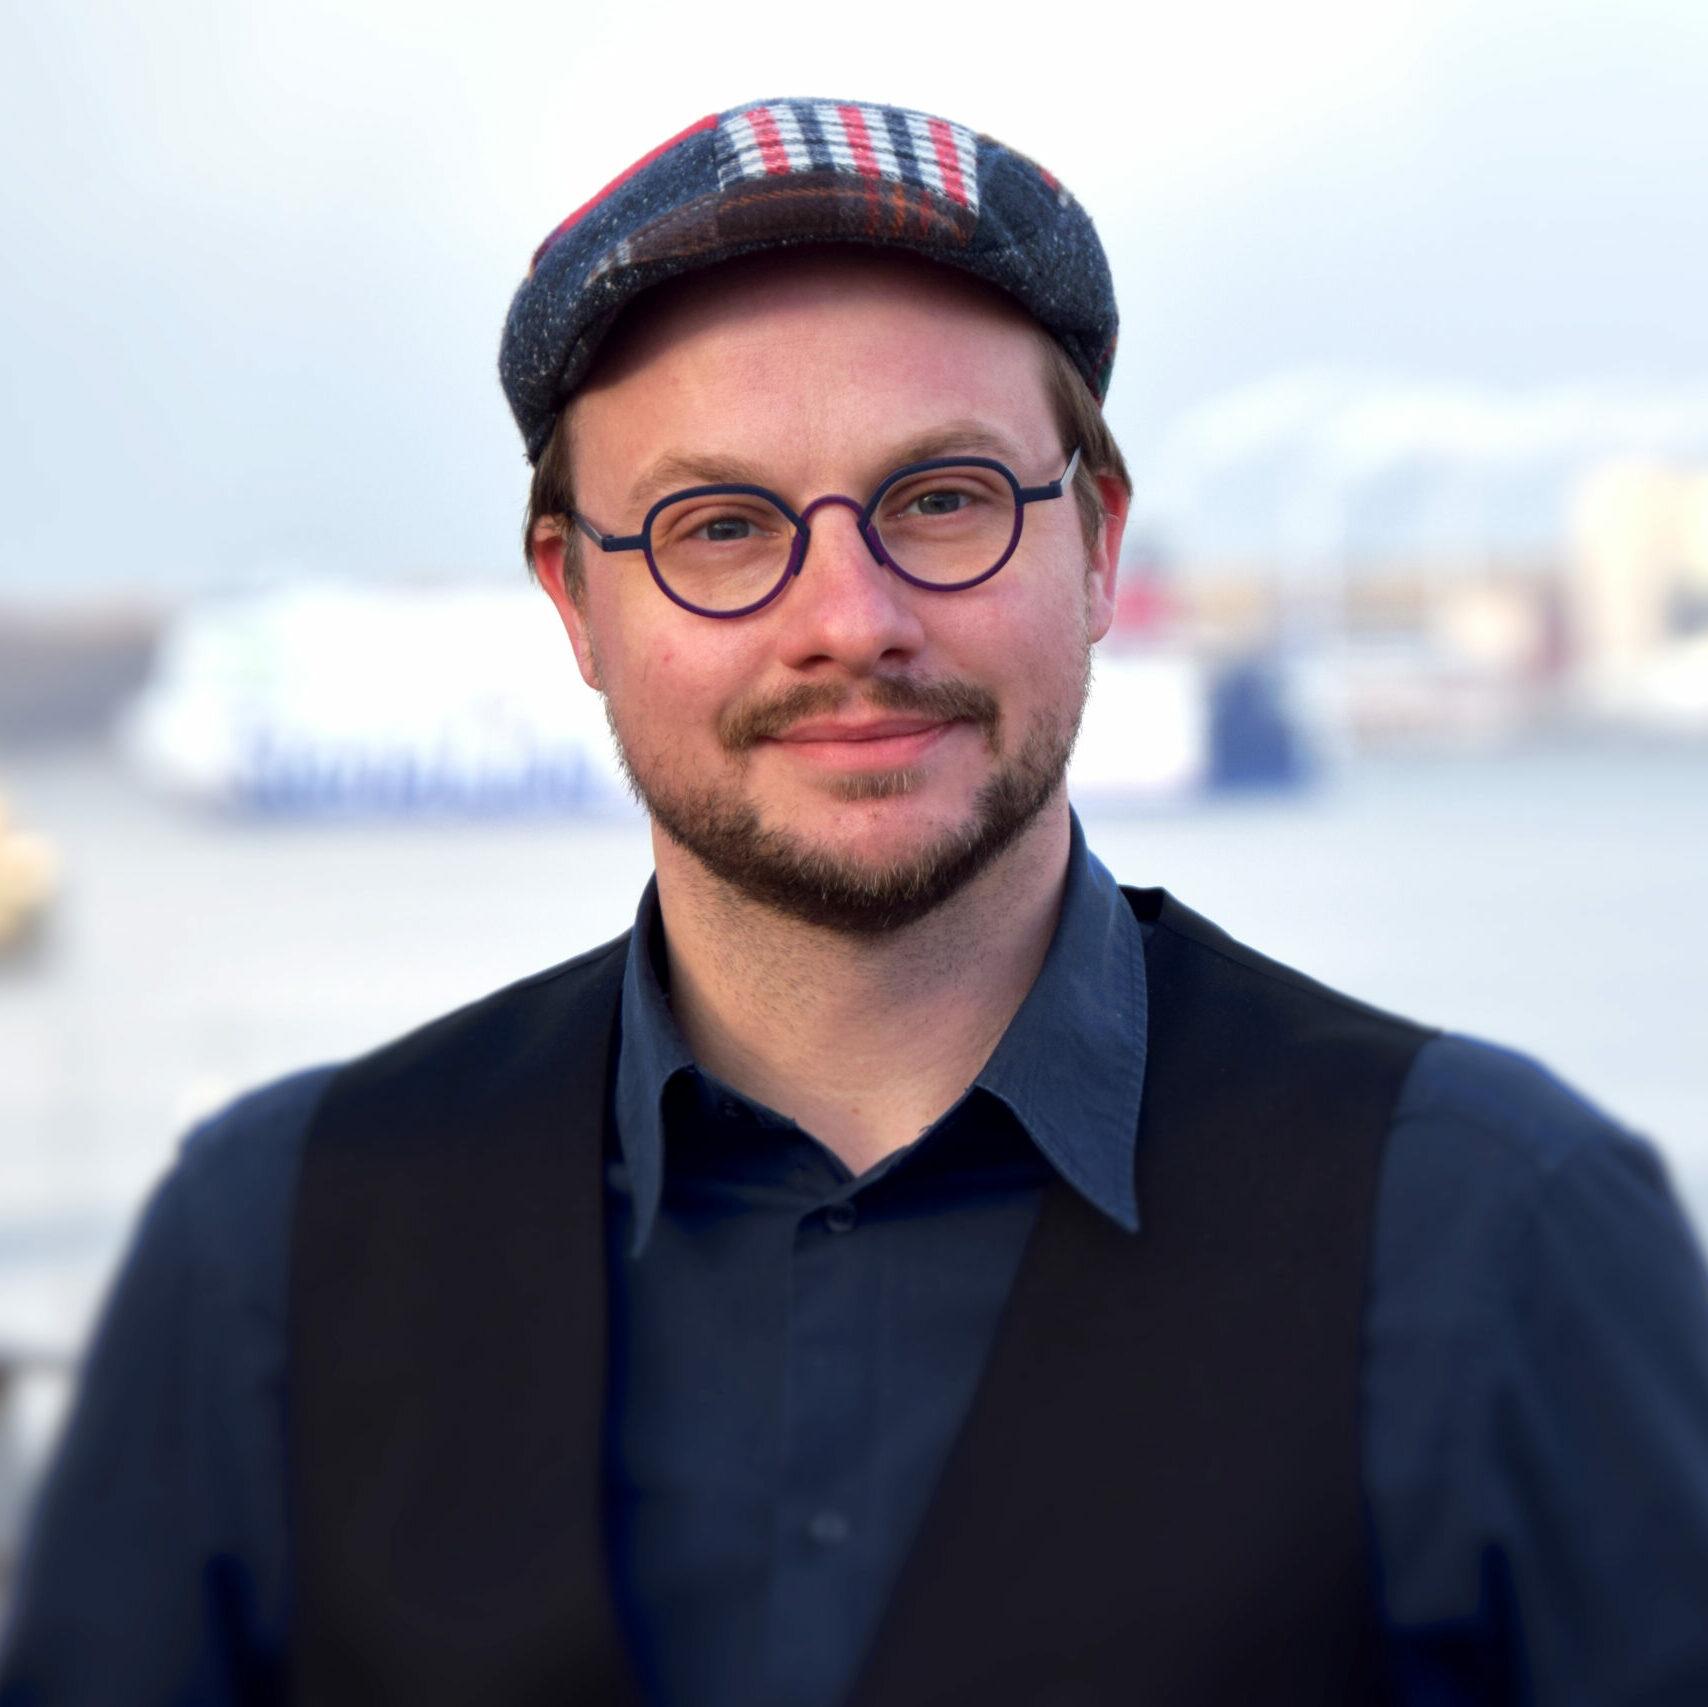 Daniel Lembke-Peters